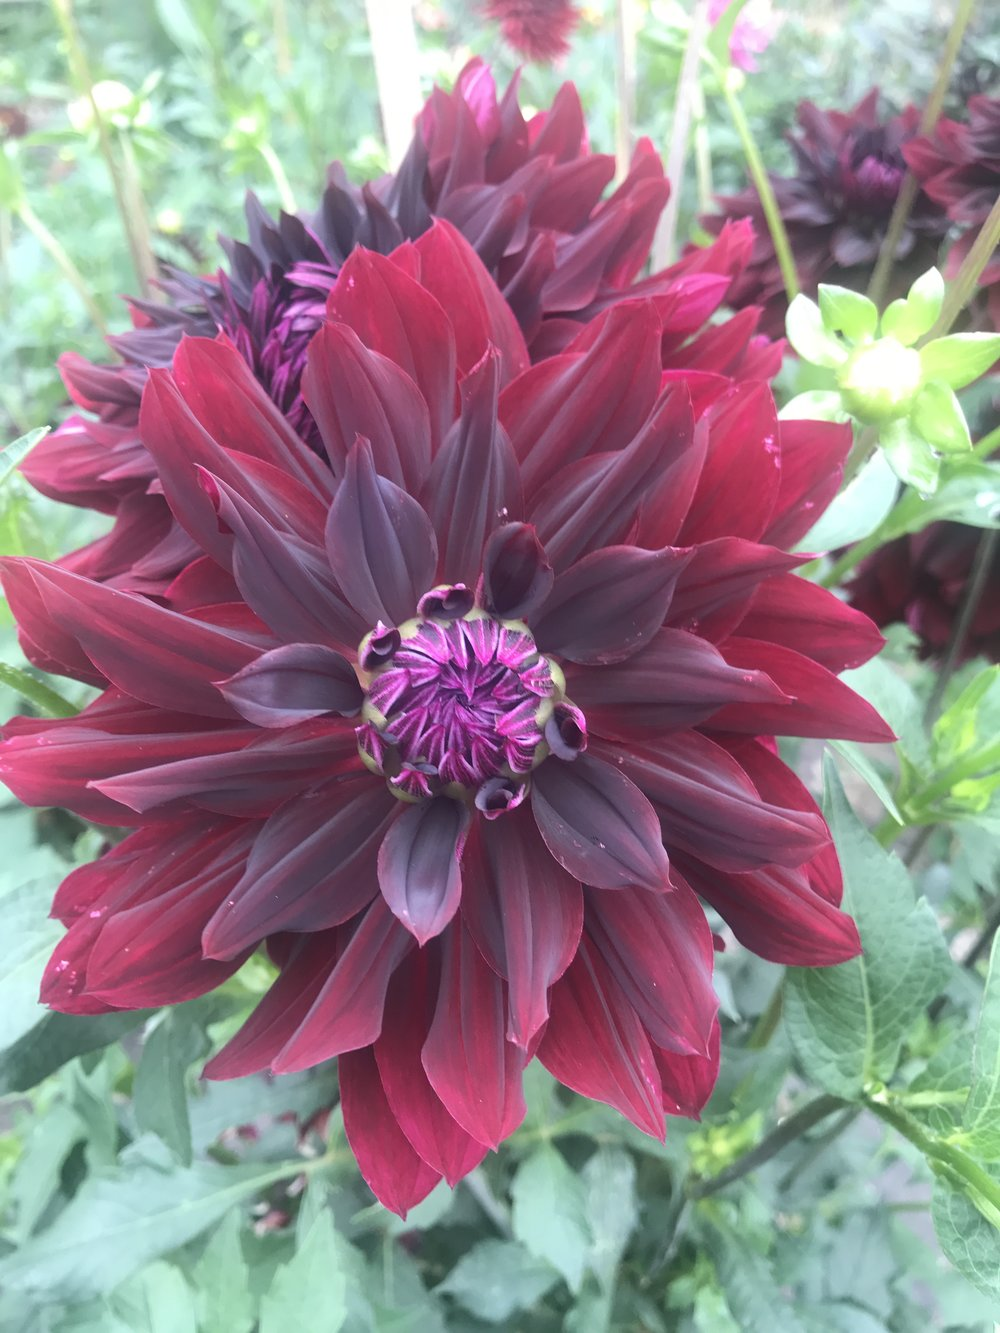 Fabulous burgundy dahlia